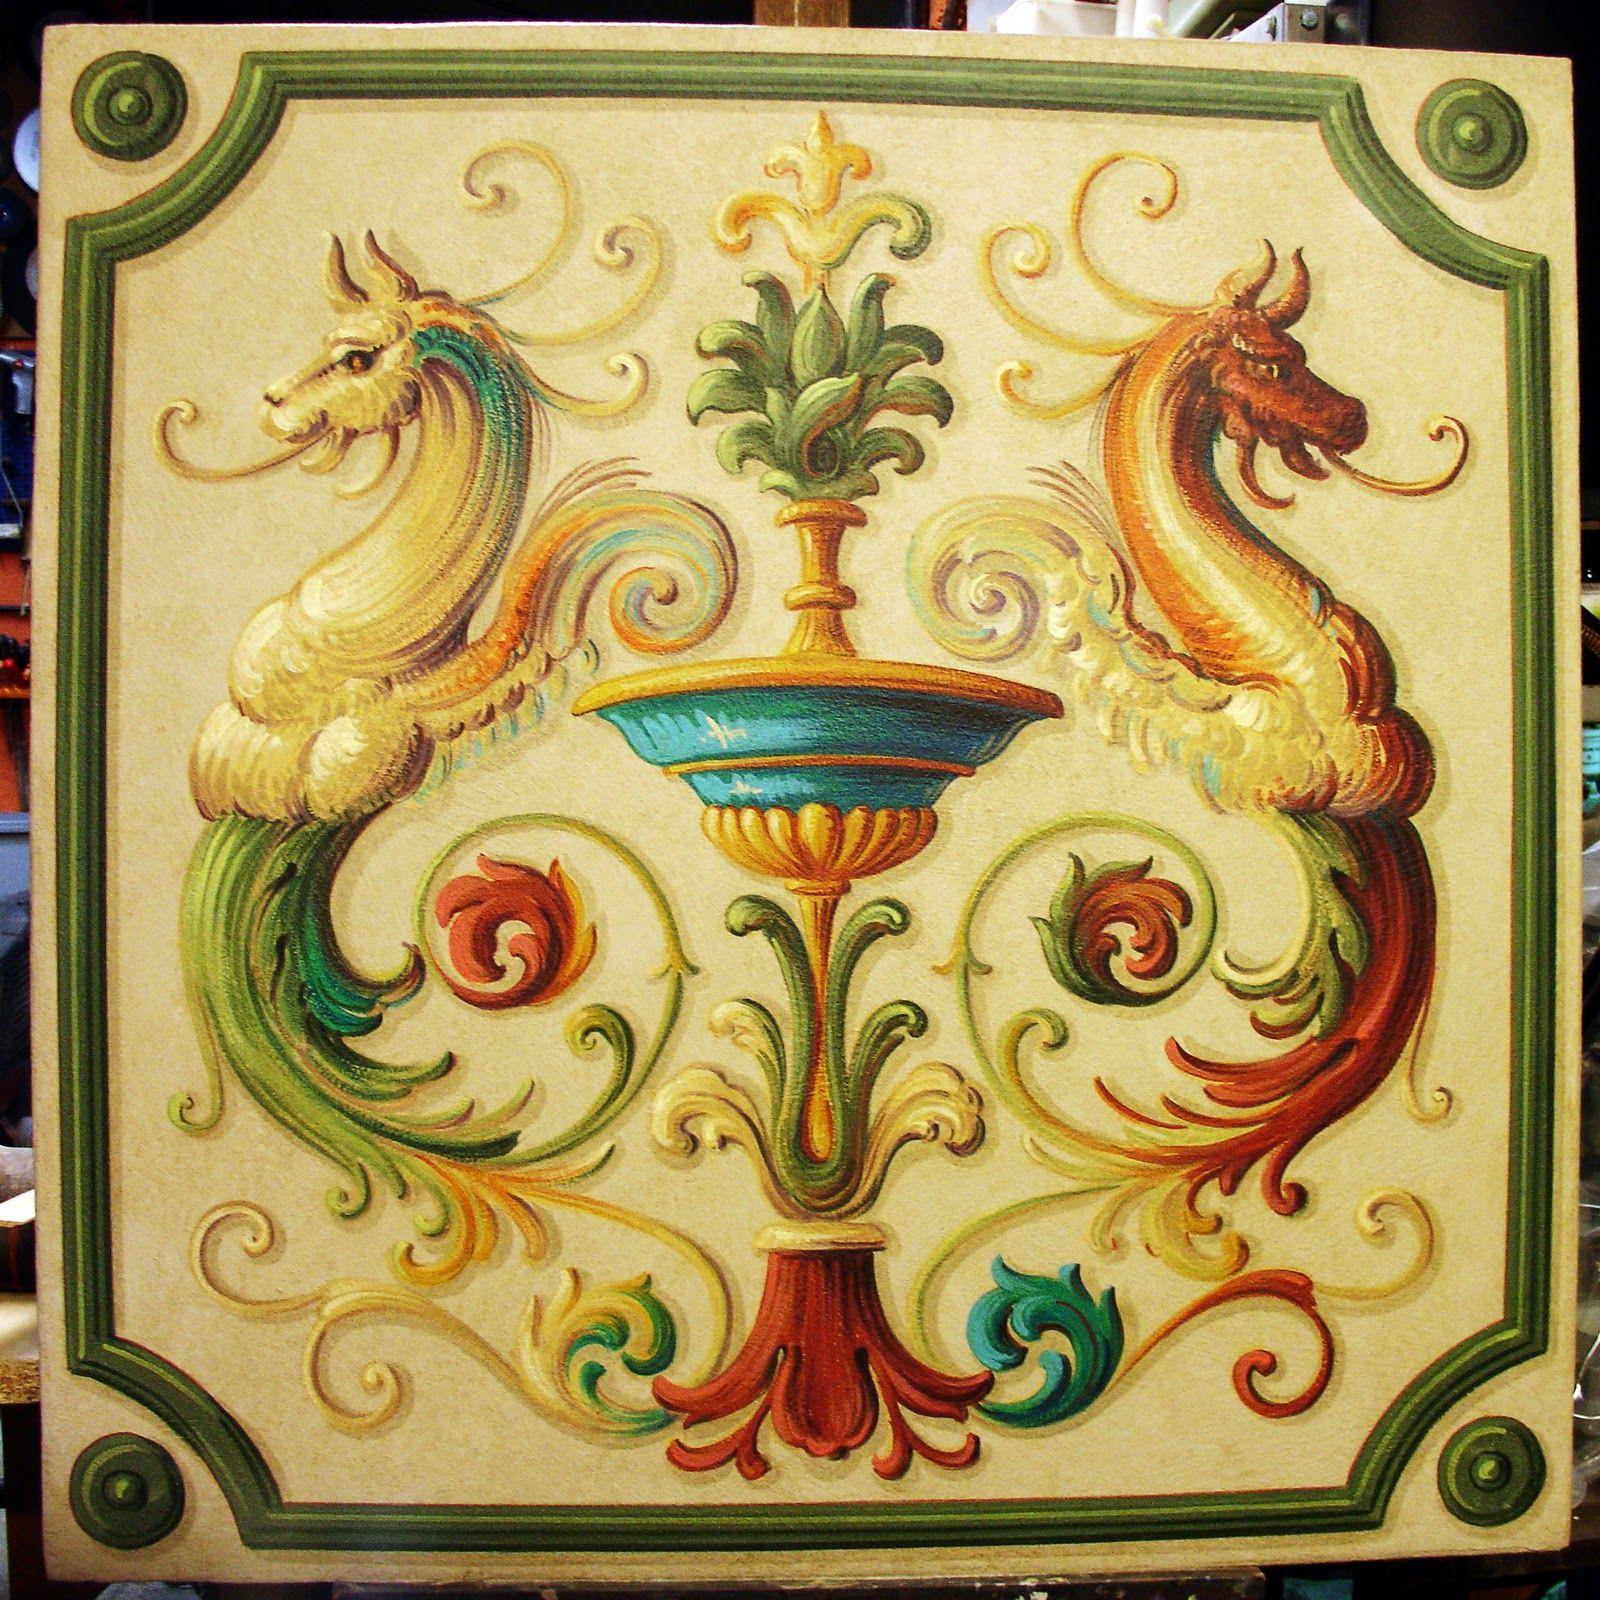 Grottesca grotesque baroque painting art e decorative for Arredamento artistico